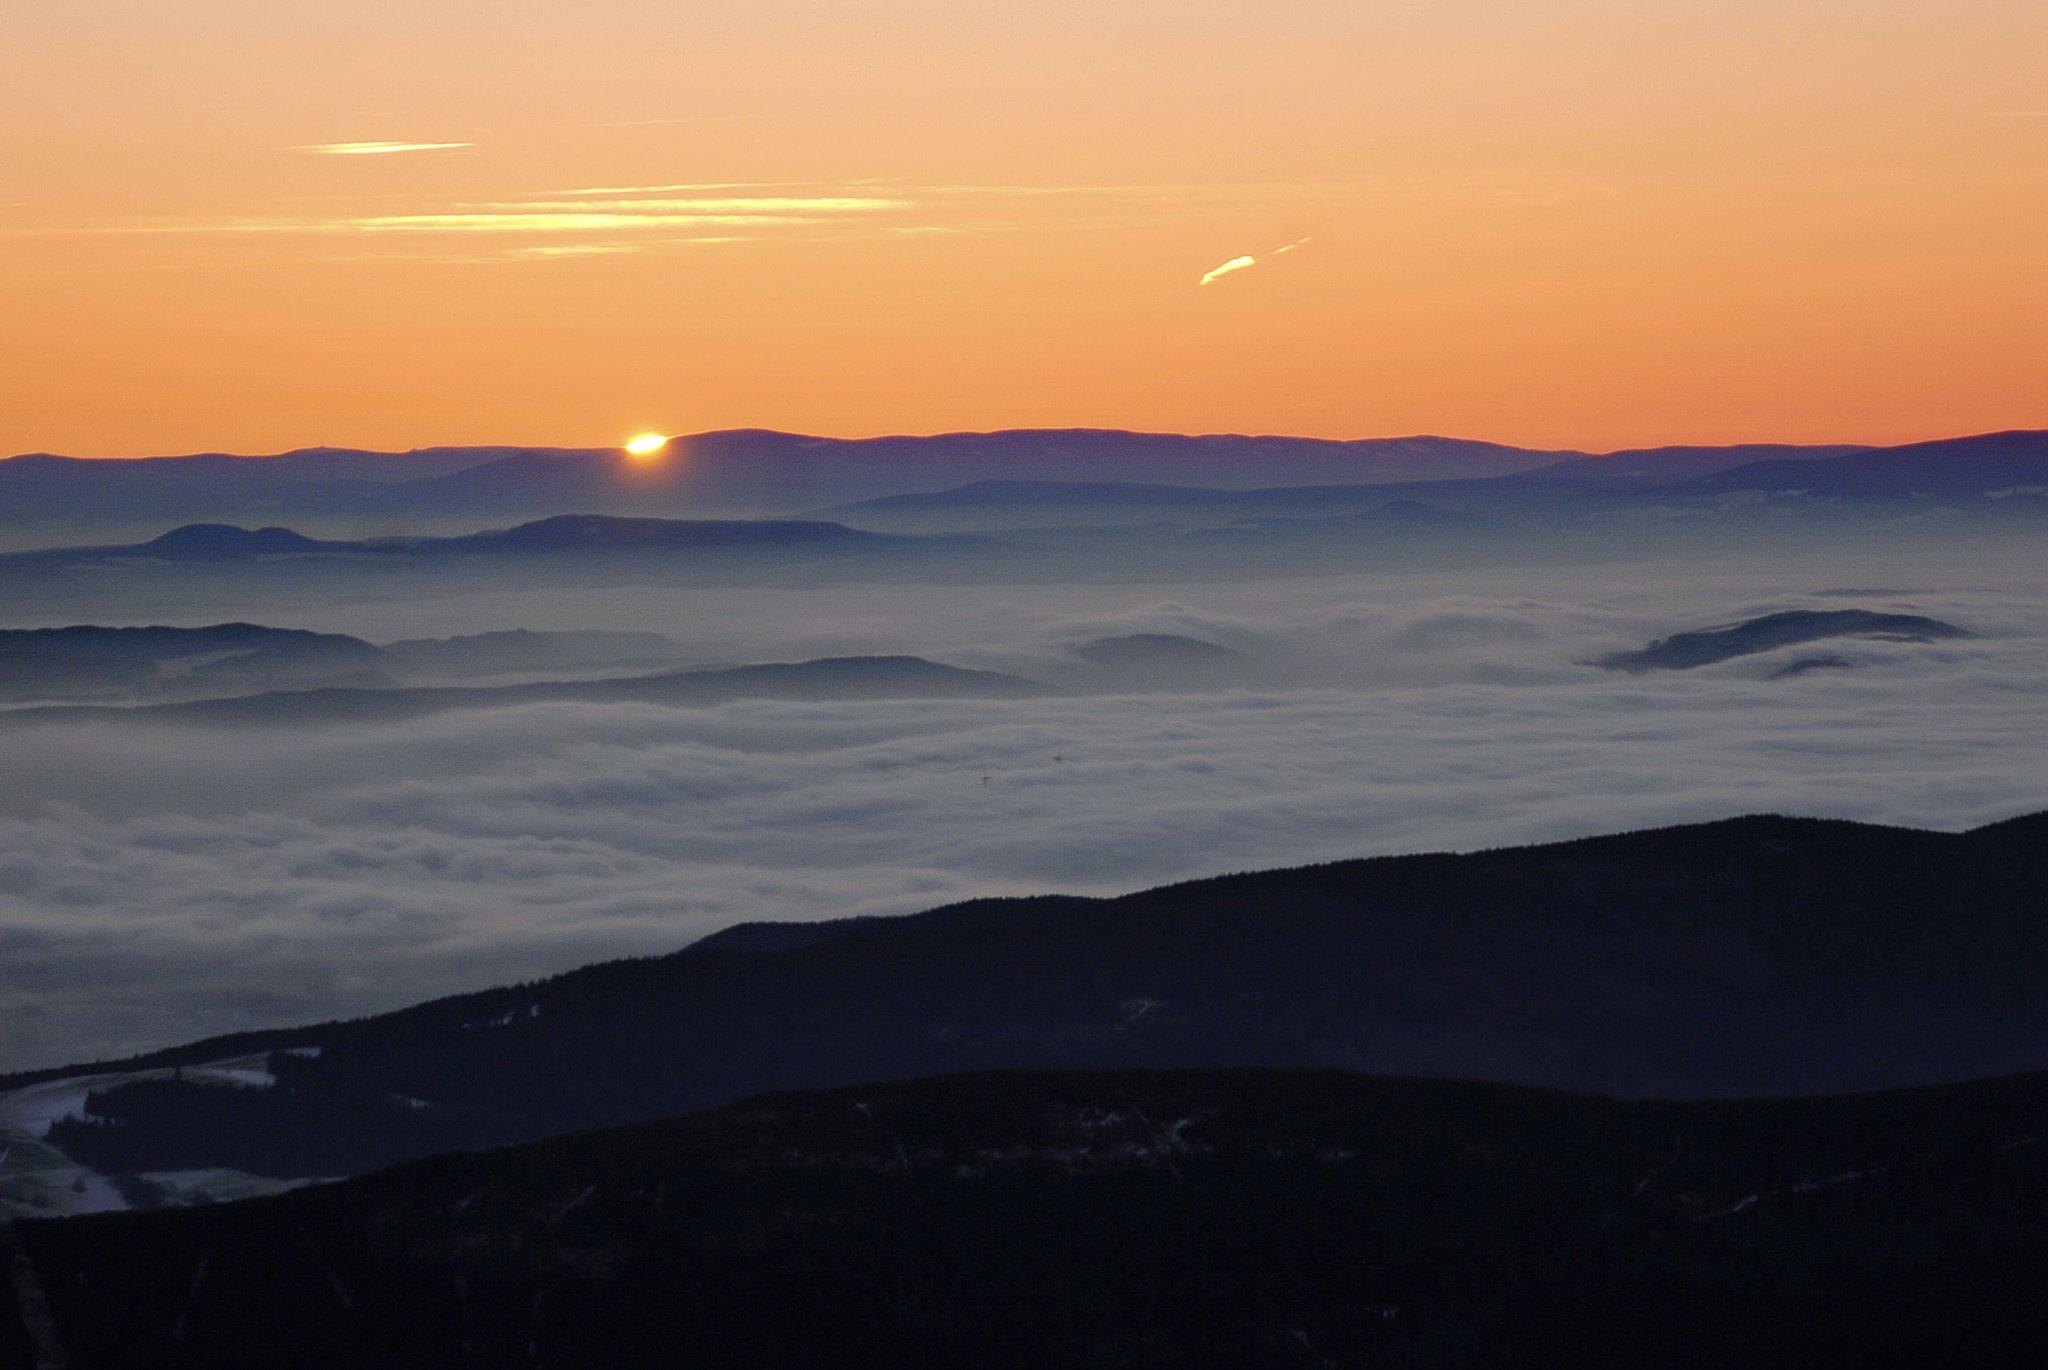 Sunrise from Snezka mountain, Poland